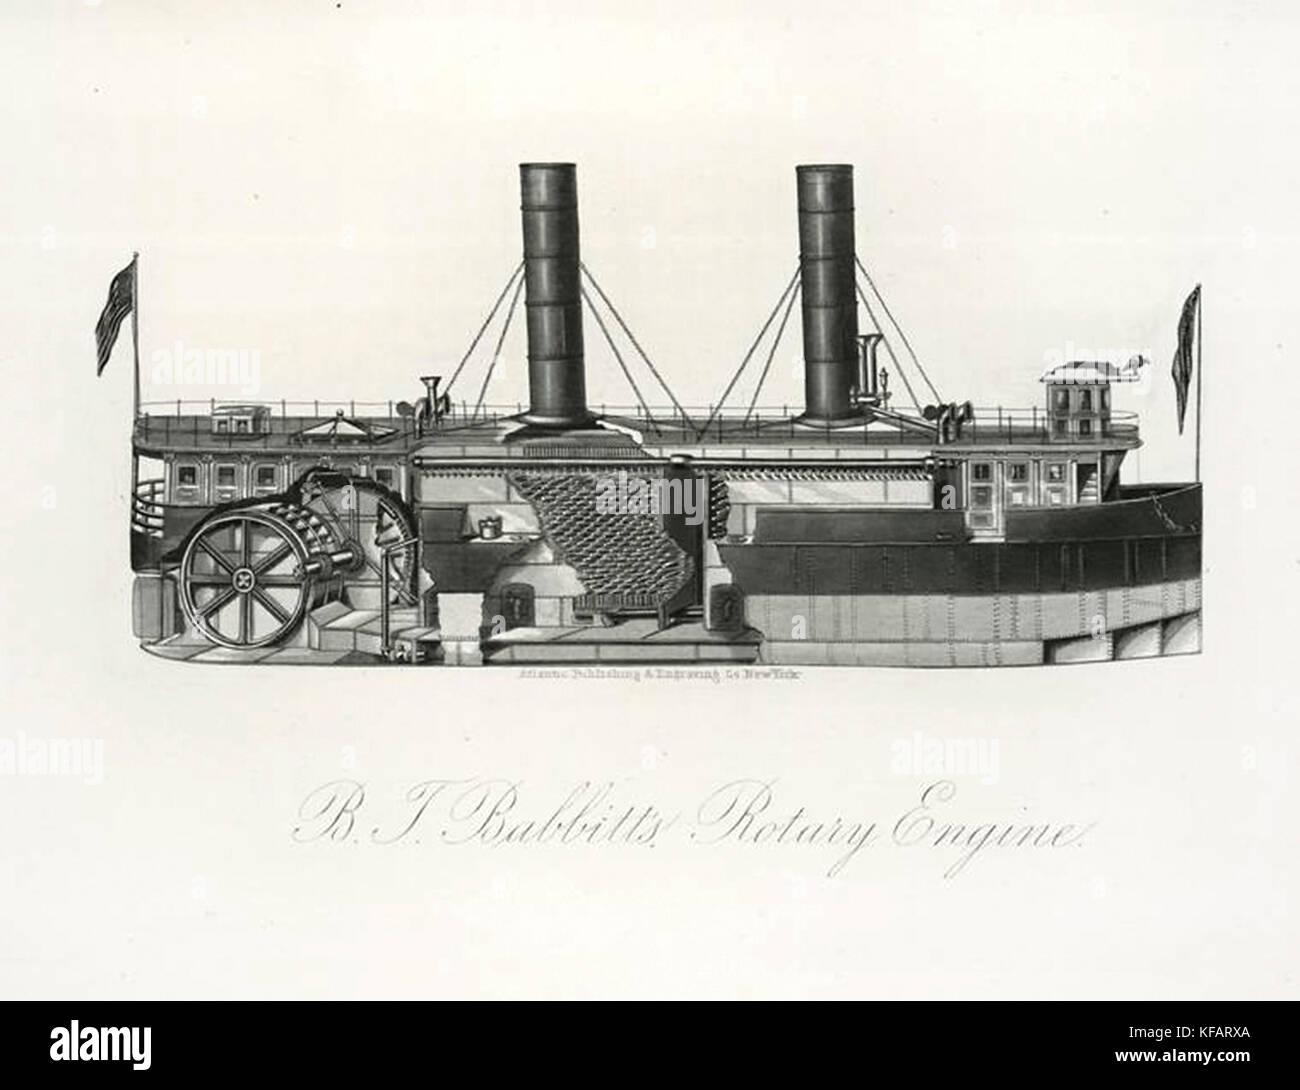 B. T. Babbitt's Rotary Engine for steam ship transportation - Stock Image